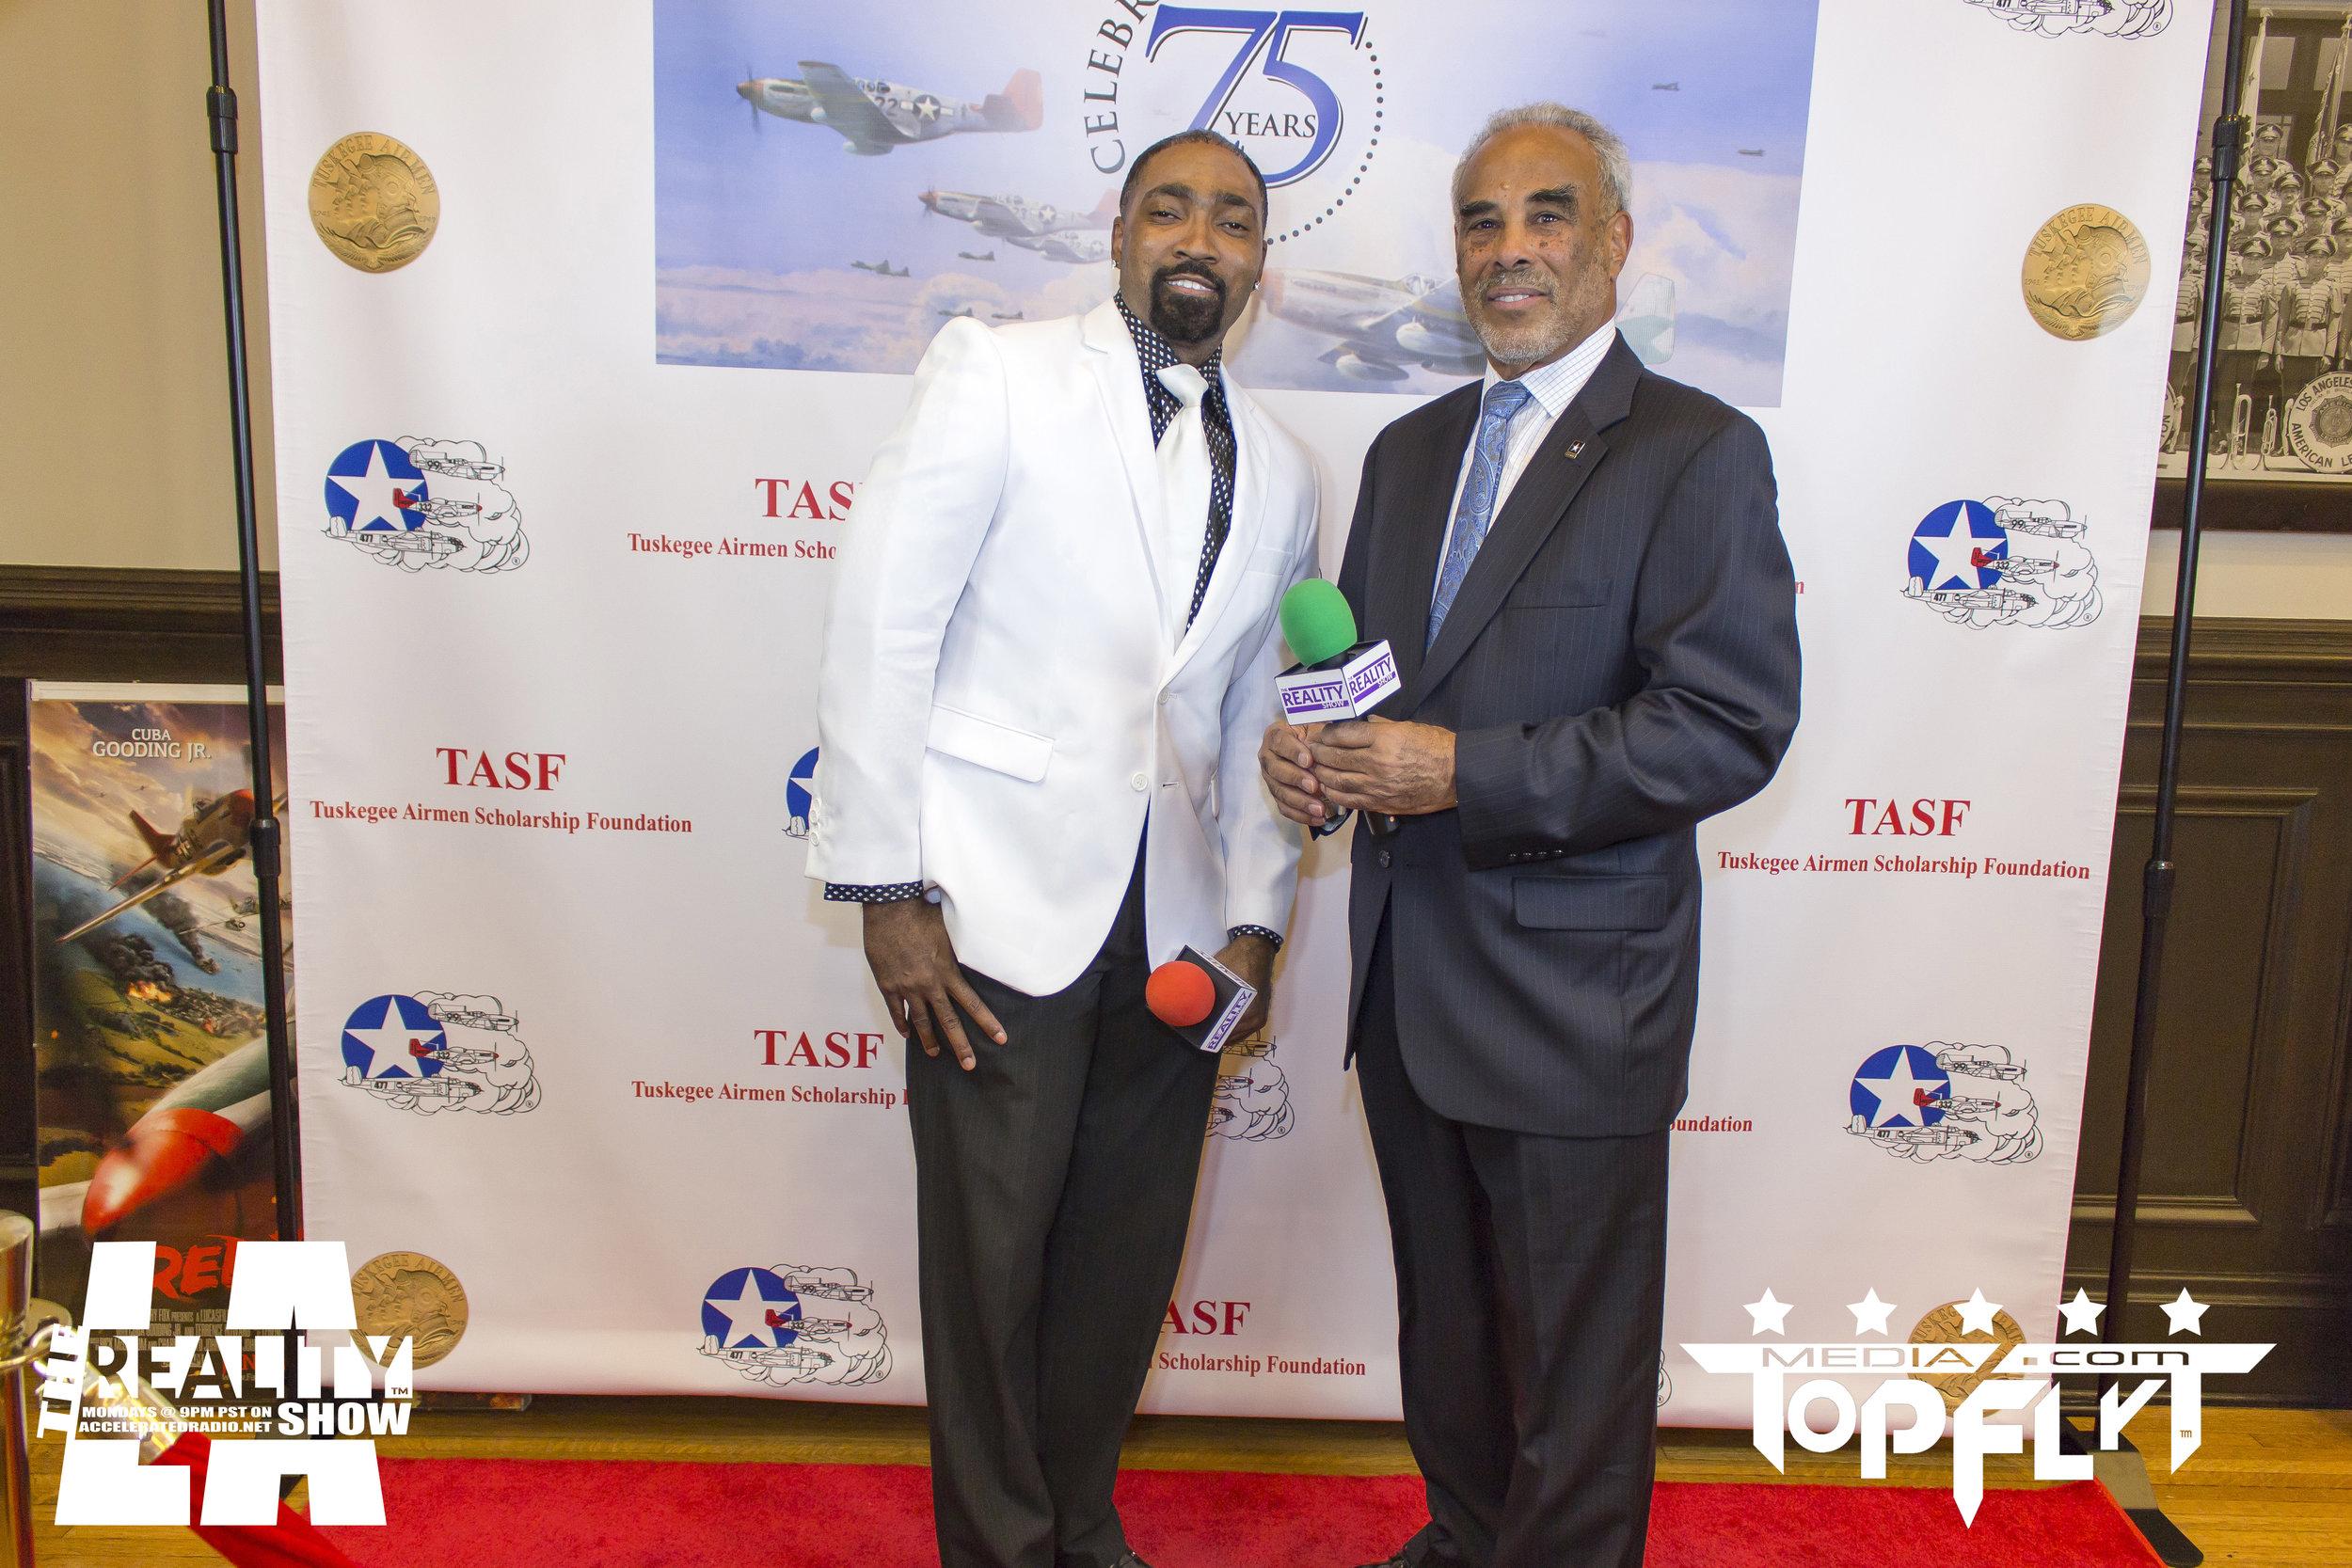 The Reality Show LA - Tuskegee Airmen 75th Anniversary VIP Reception_64.jpg